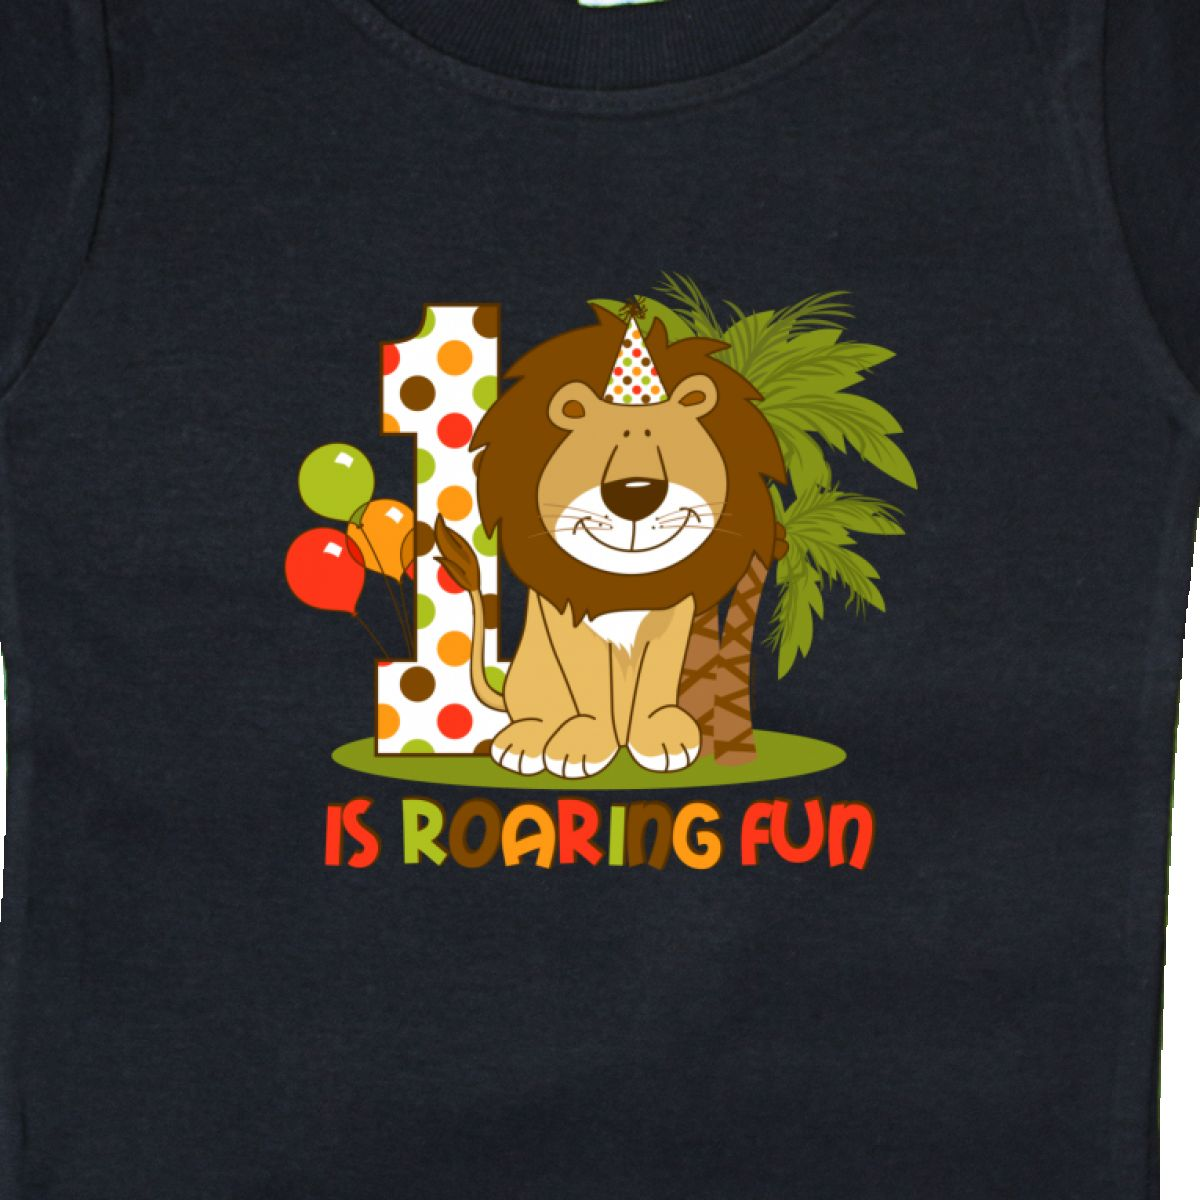 Inktastic-Cute-Lion-1st-Birthday-Baby-T-Shirt-Roaring-Fun-Pinkinkartkids-First thumbnail 4